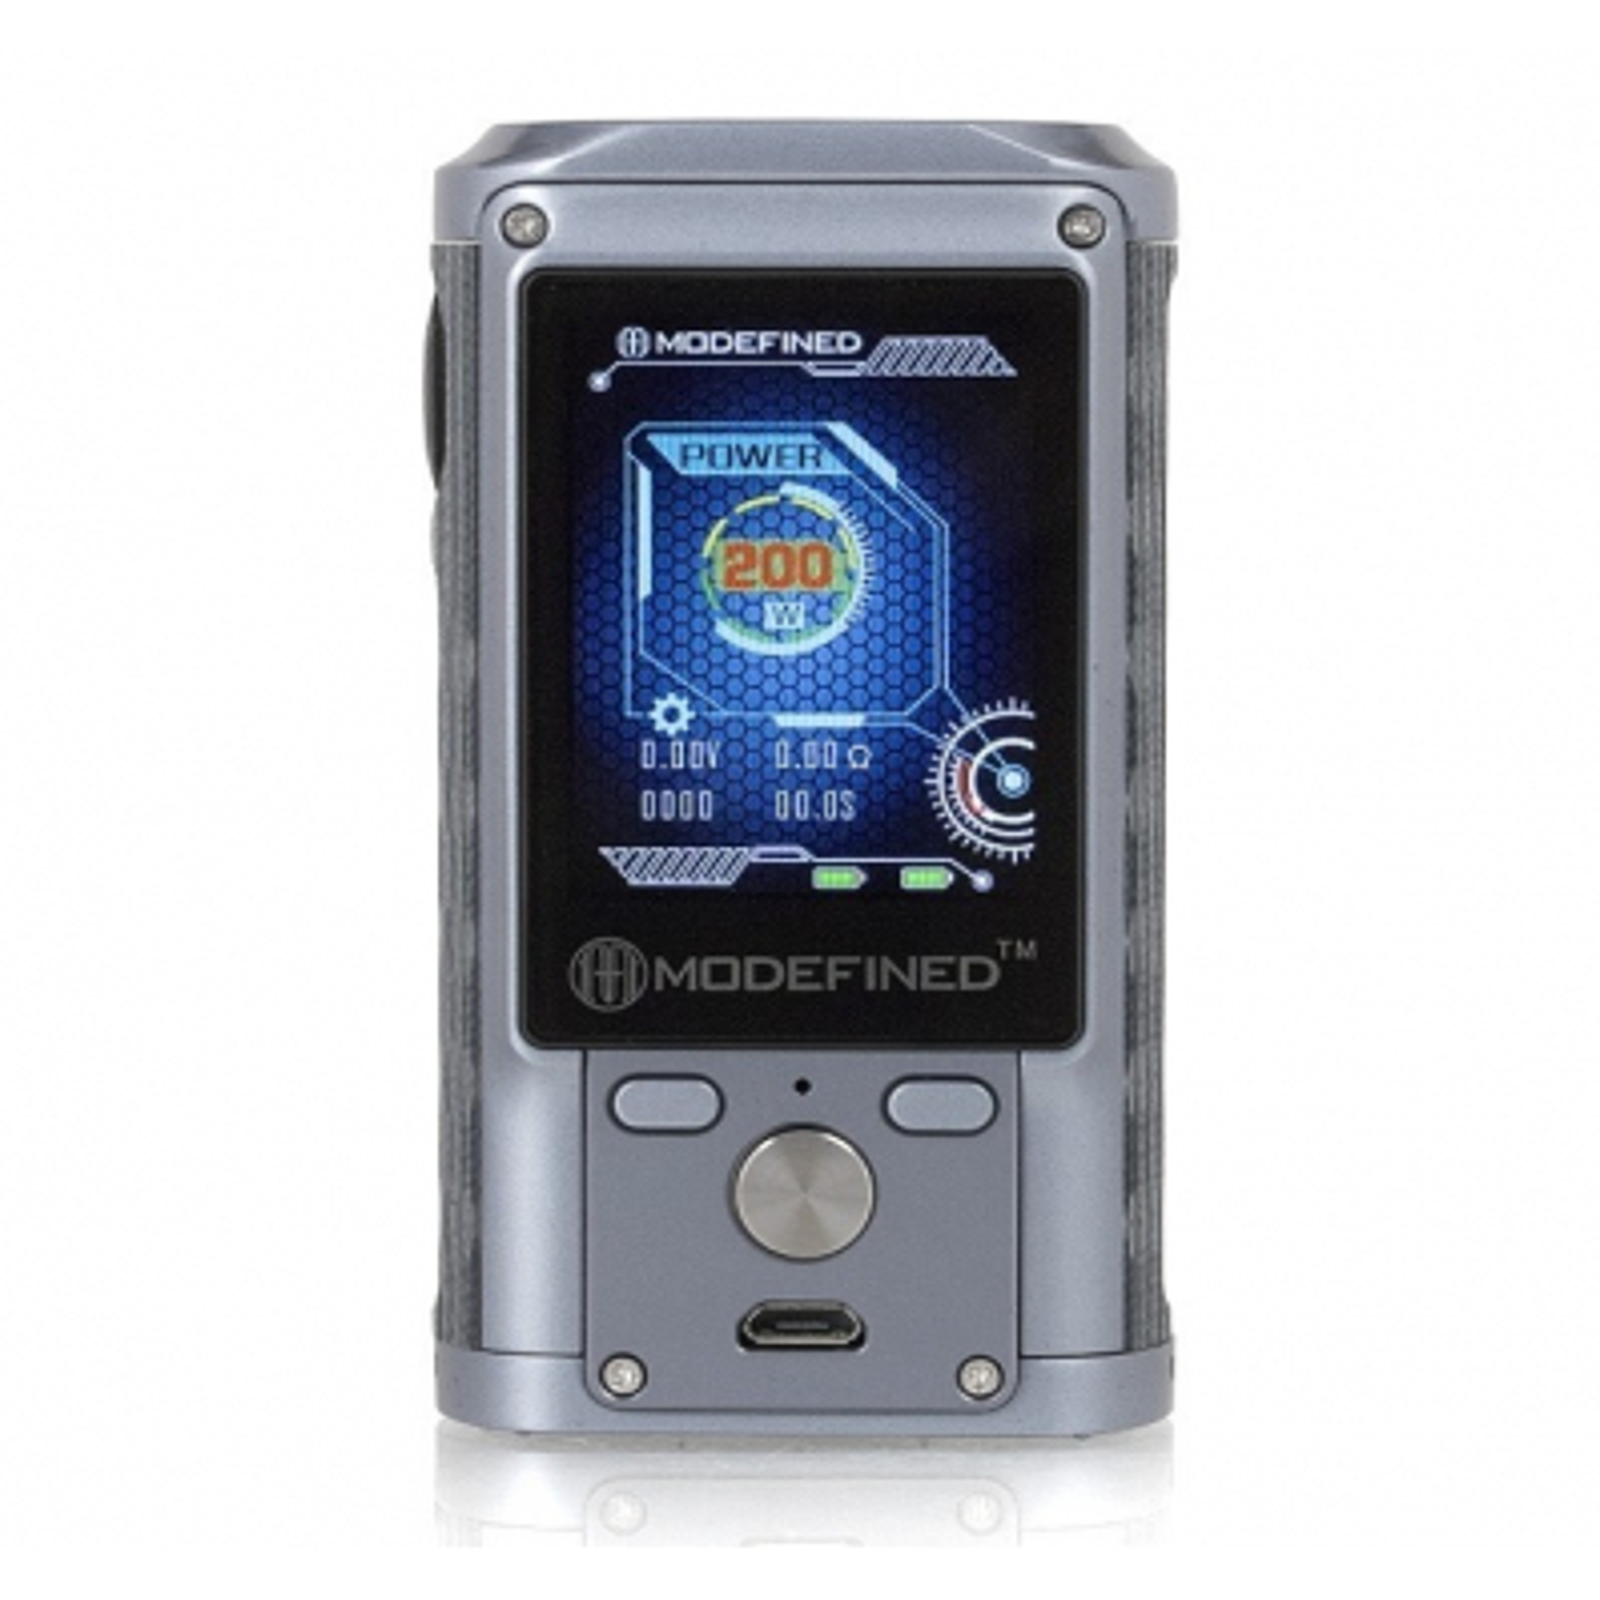 Draco 200W - Modefined